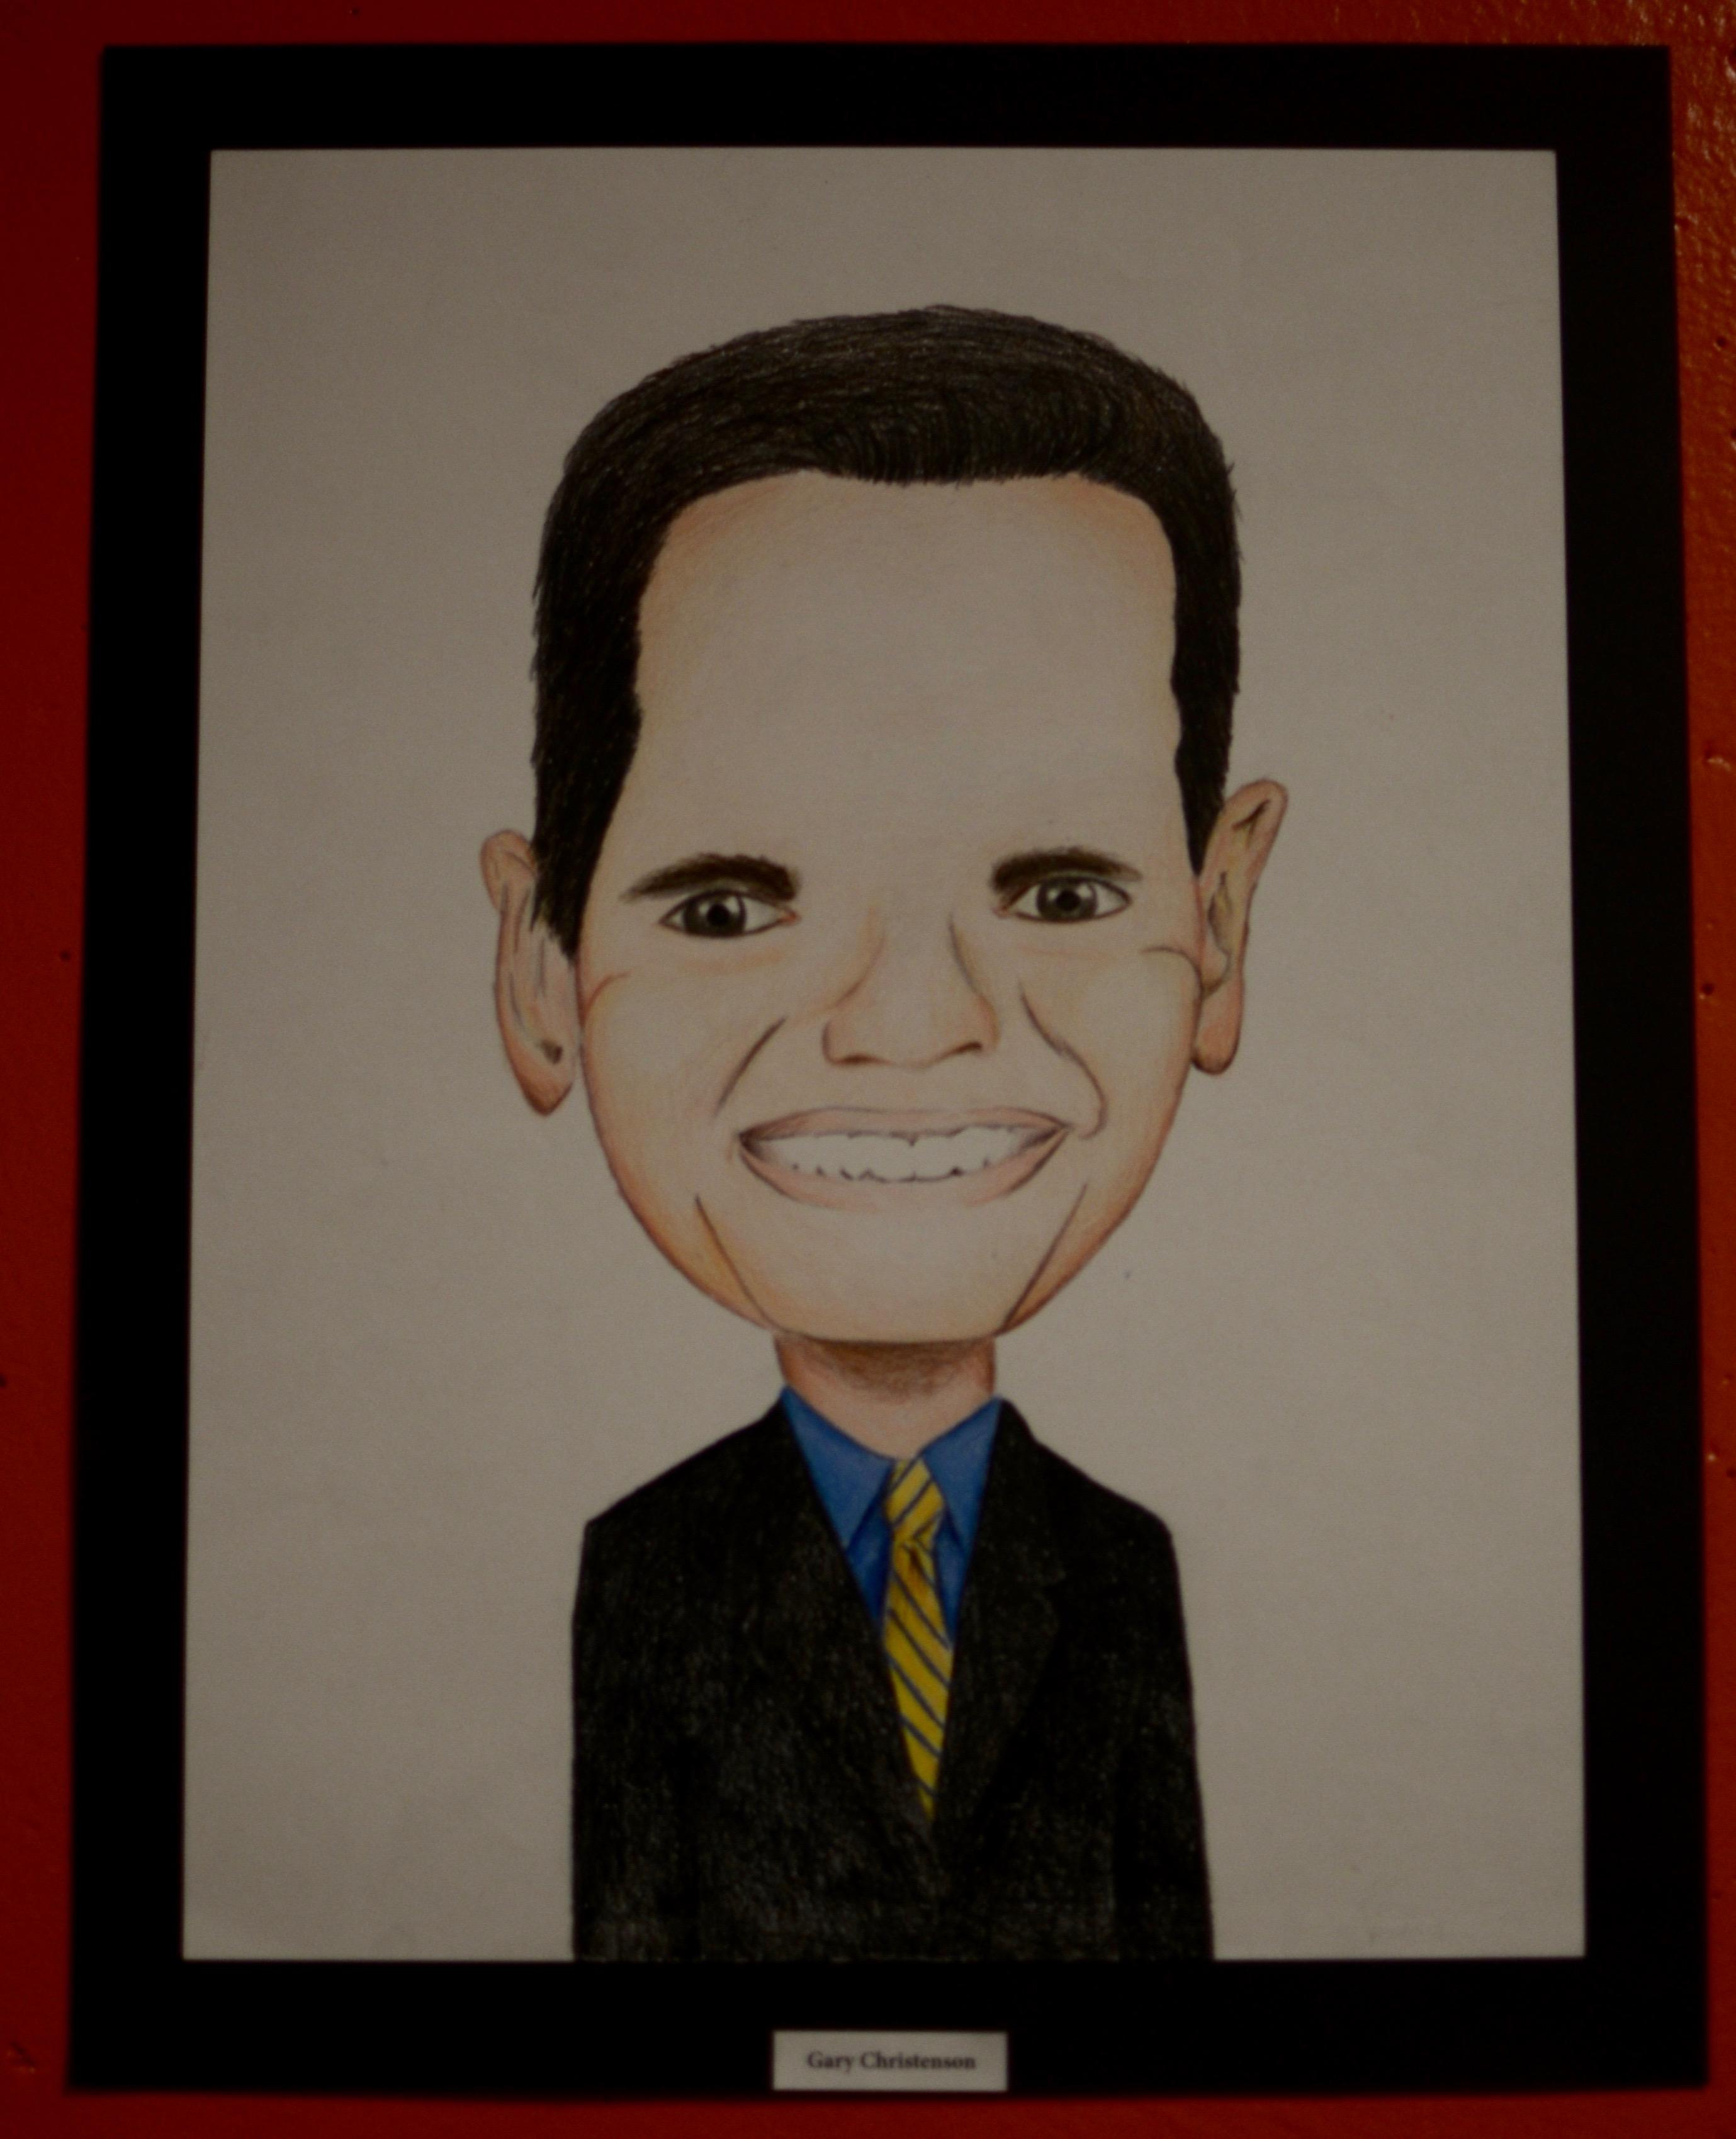 Portrait of Mayor Gary Christenson by Mr. Luongo's Studio 2 Honors class. Photo taken by Ryan Hames.